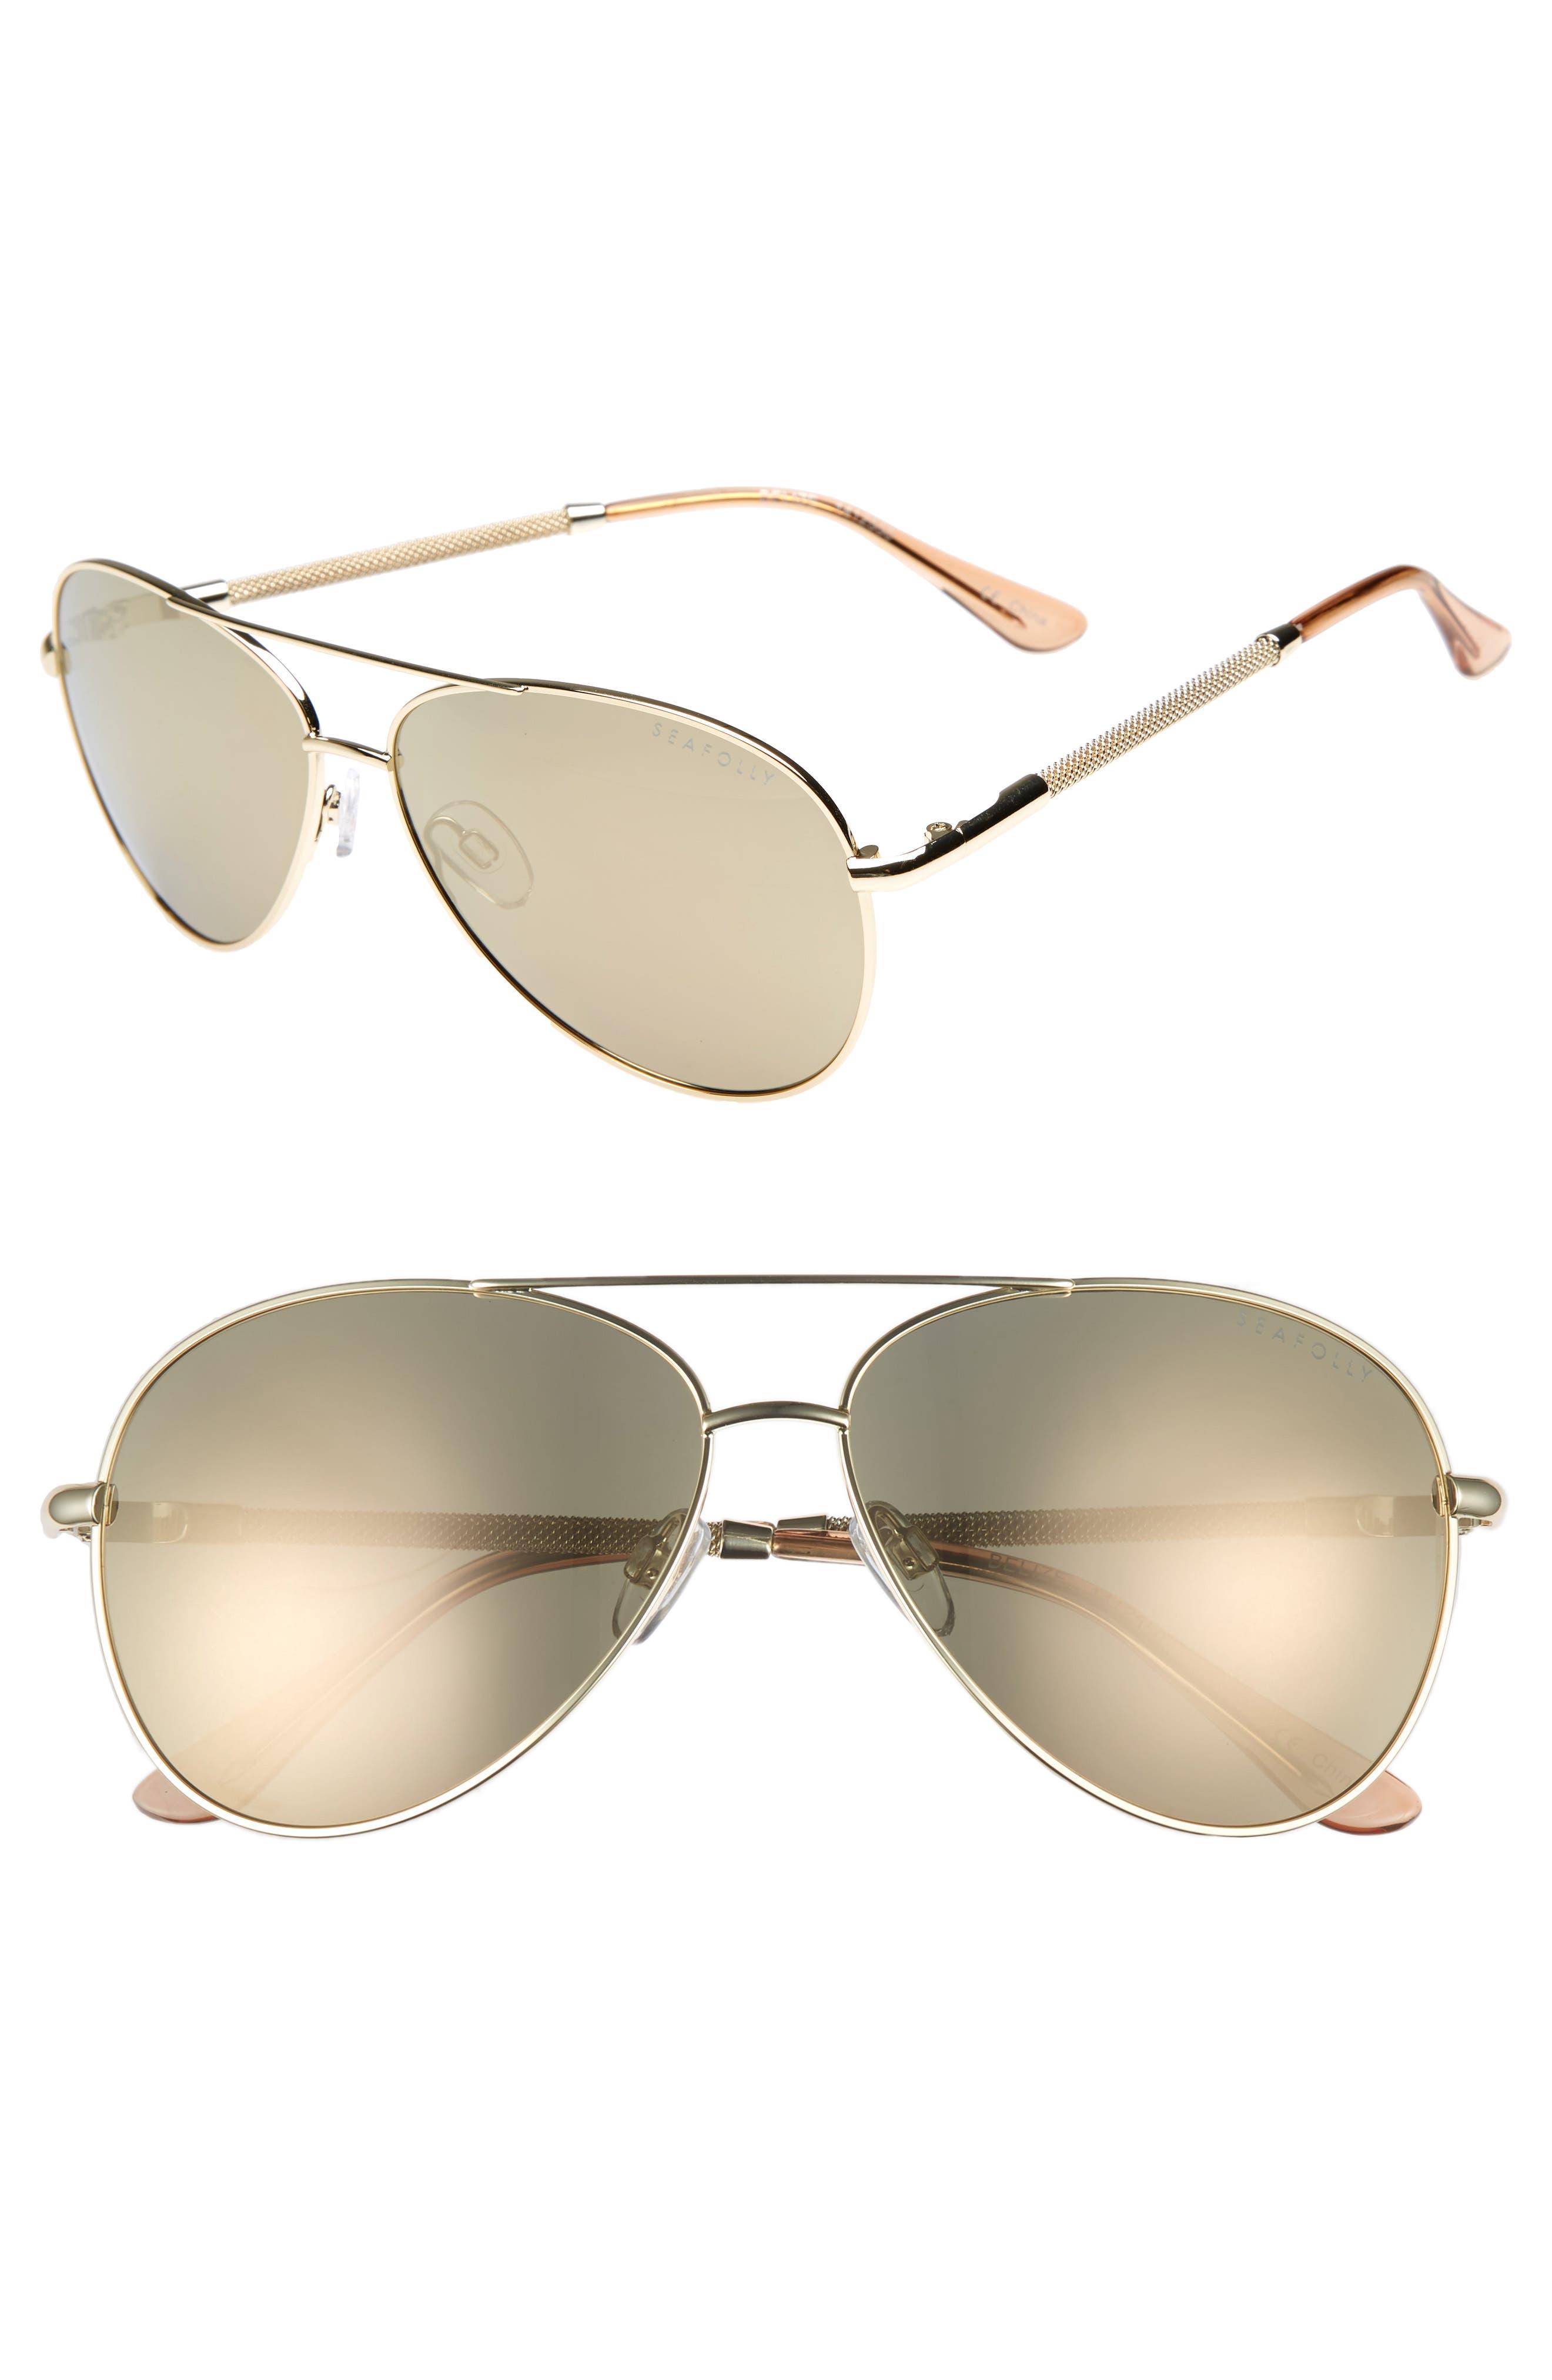 Belize 59mm Aviator Sunglasses,                         Main,                         color, 710